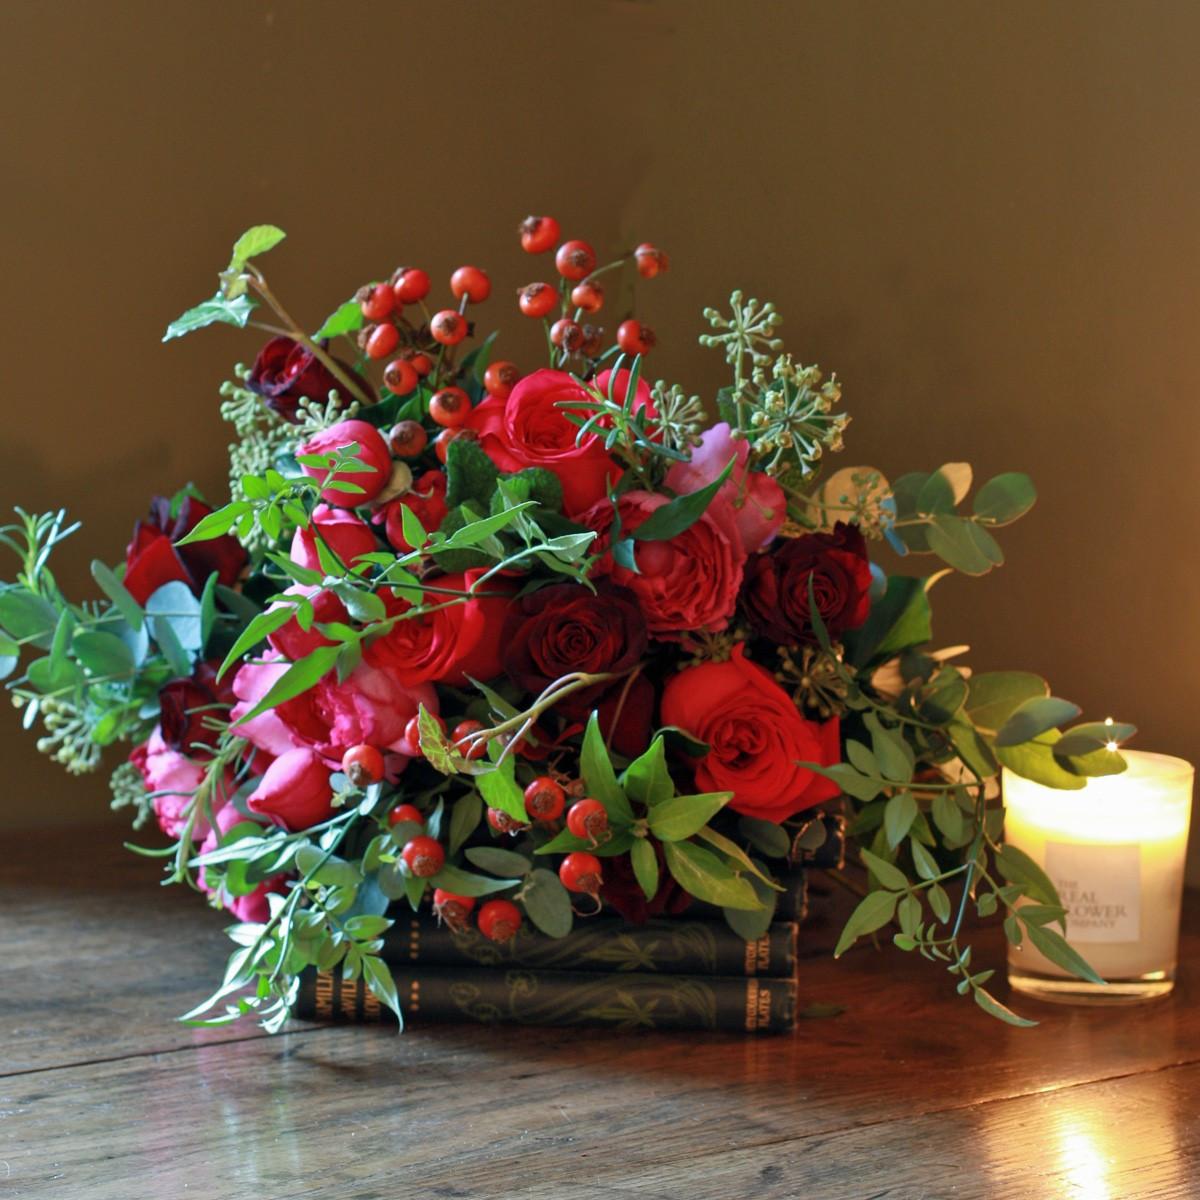 Christmas Flower Images  Festive Florals Seasonal Flower Arrangements for